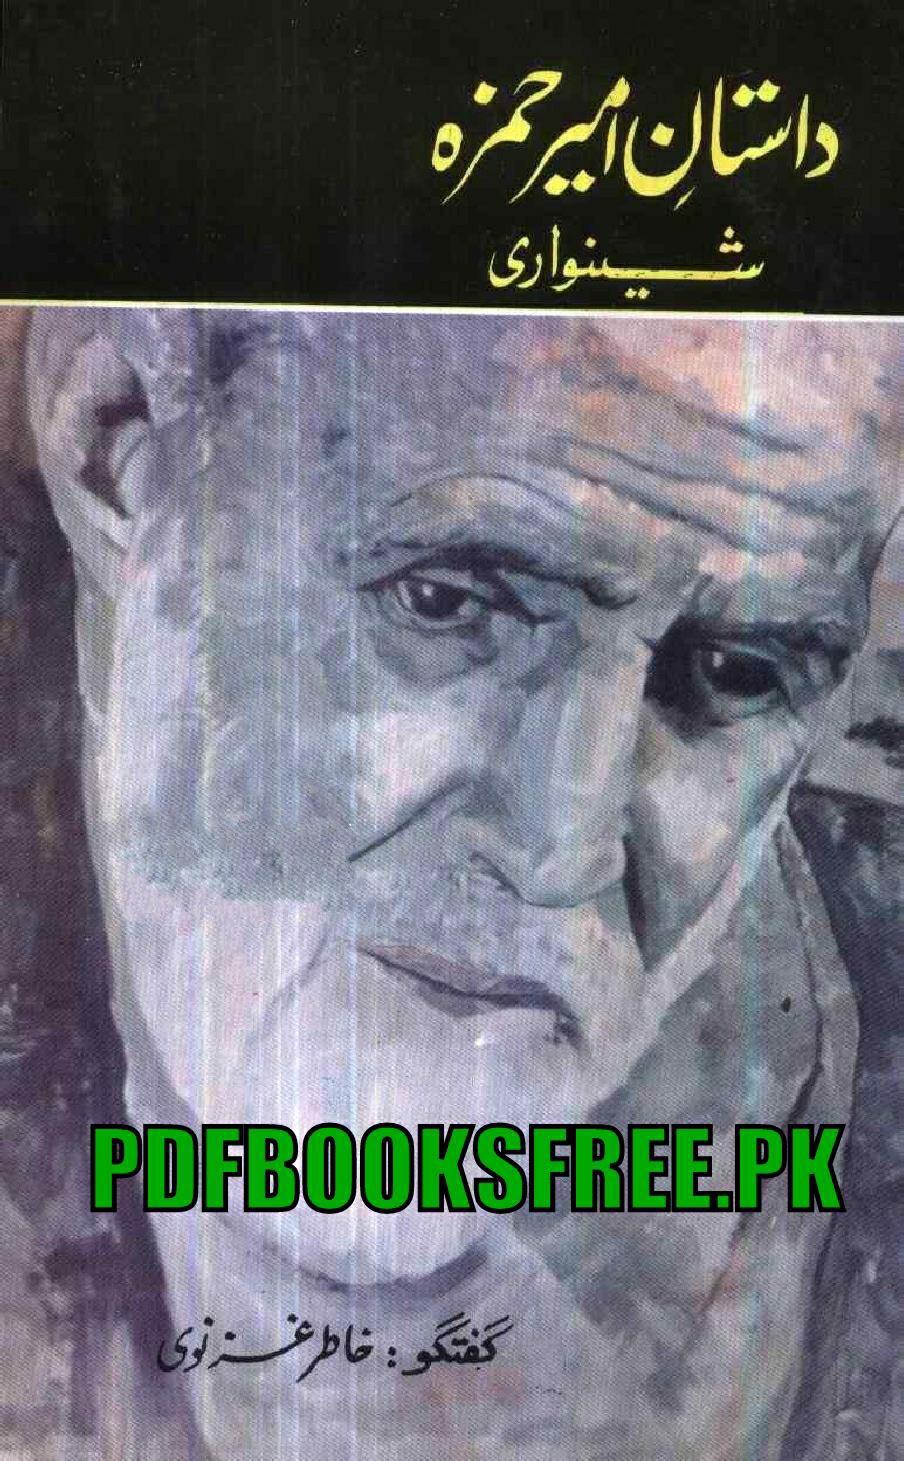 Dastan e Ameer Hamza Shinwari Baba By Khatir Ghaznavi Pdf Ree Download